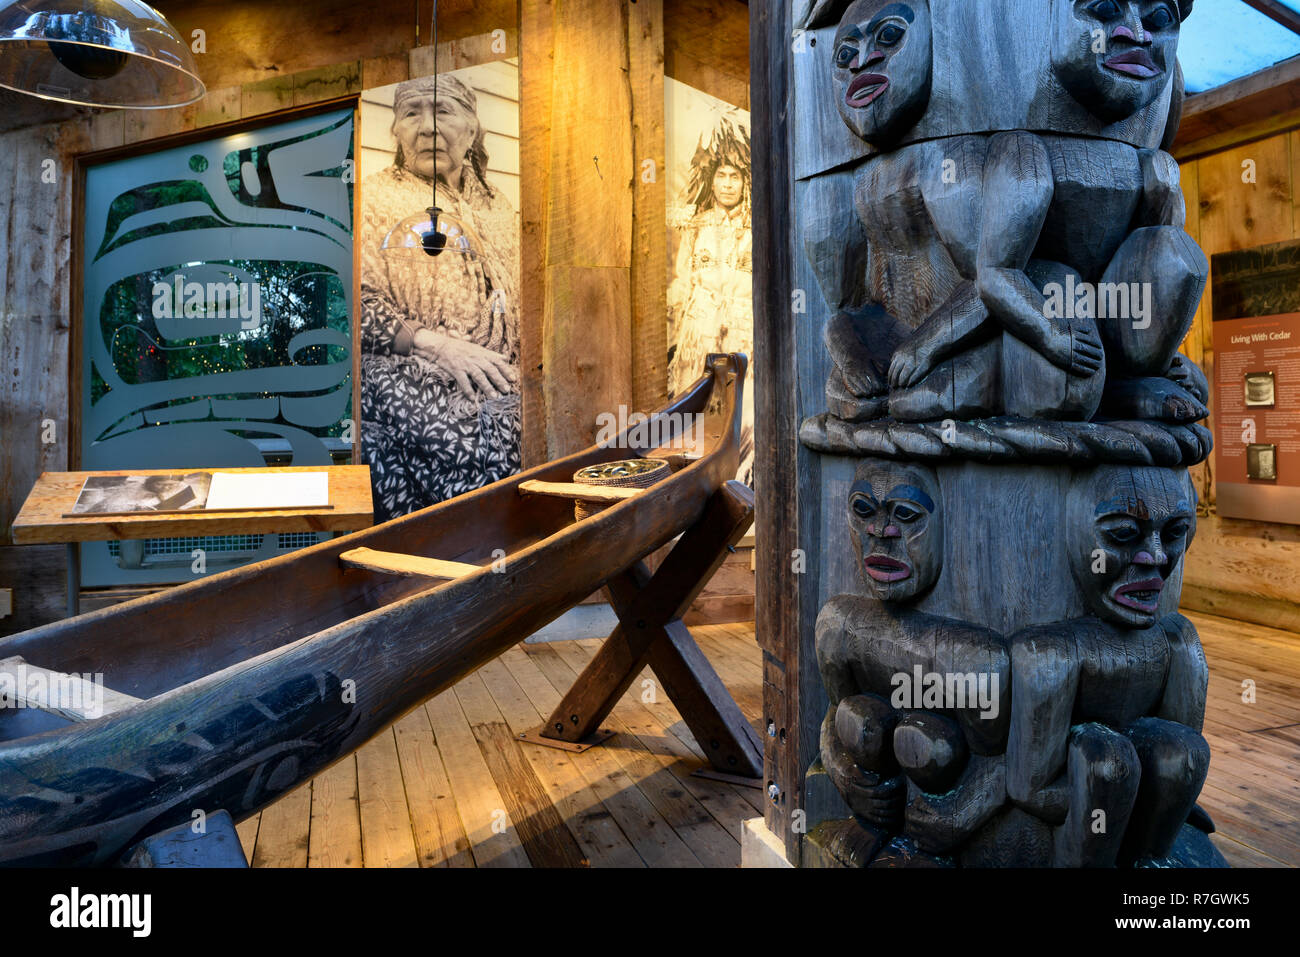 Kia North Vancouver >> Kia Palano First Nations Exhibit Capilano Suspension Bridge